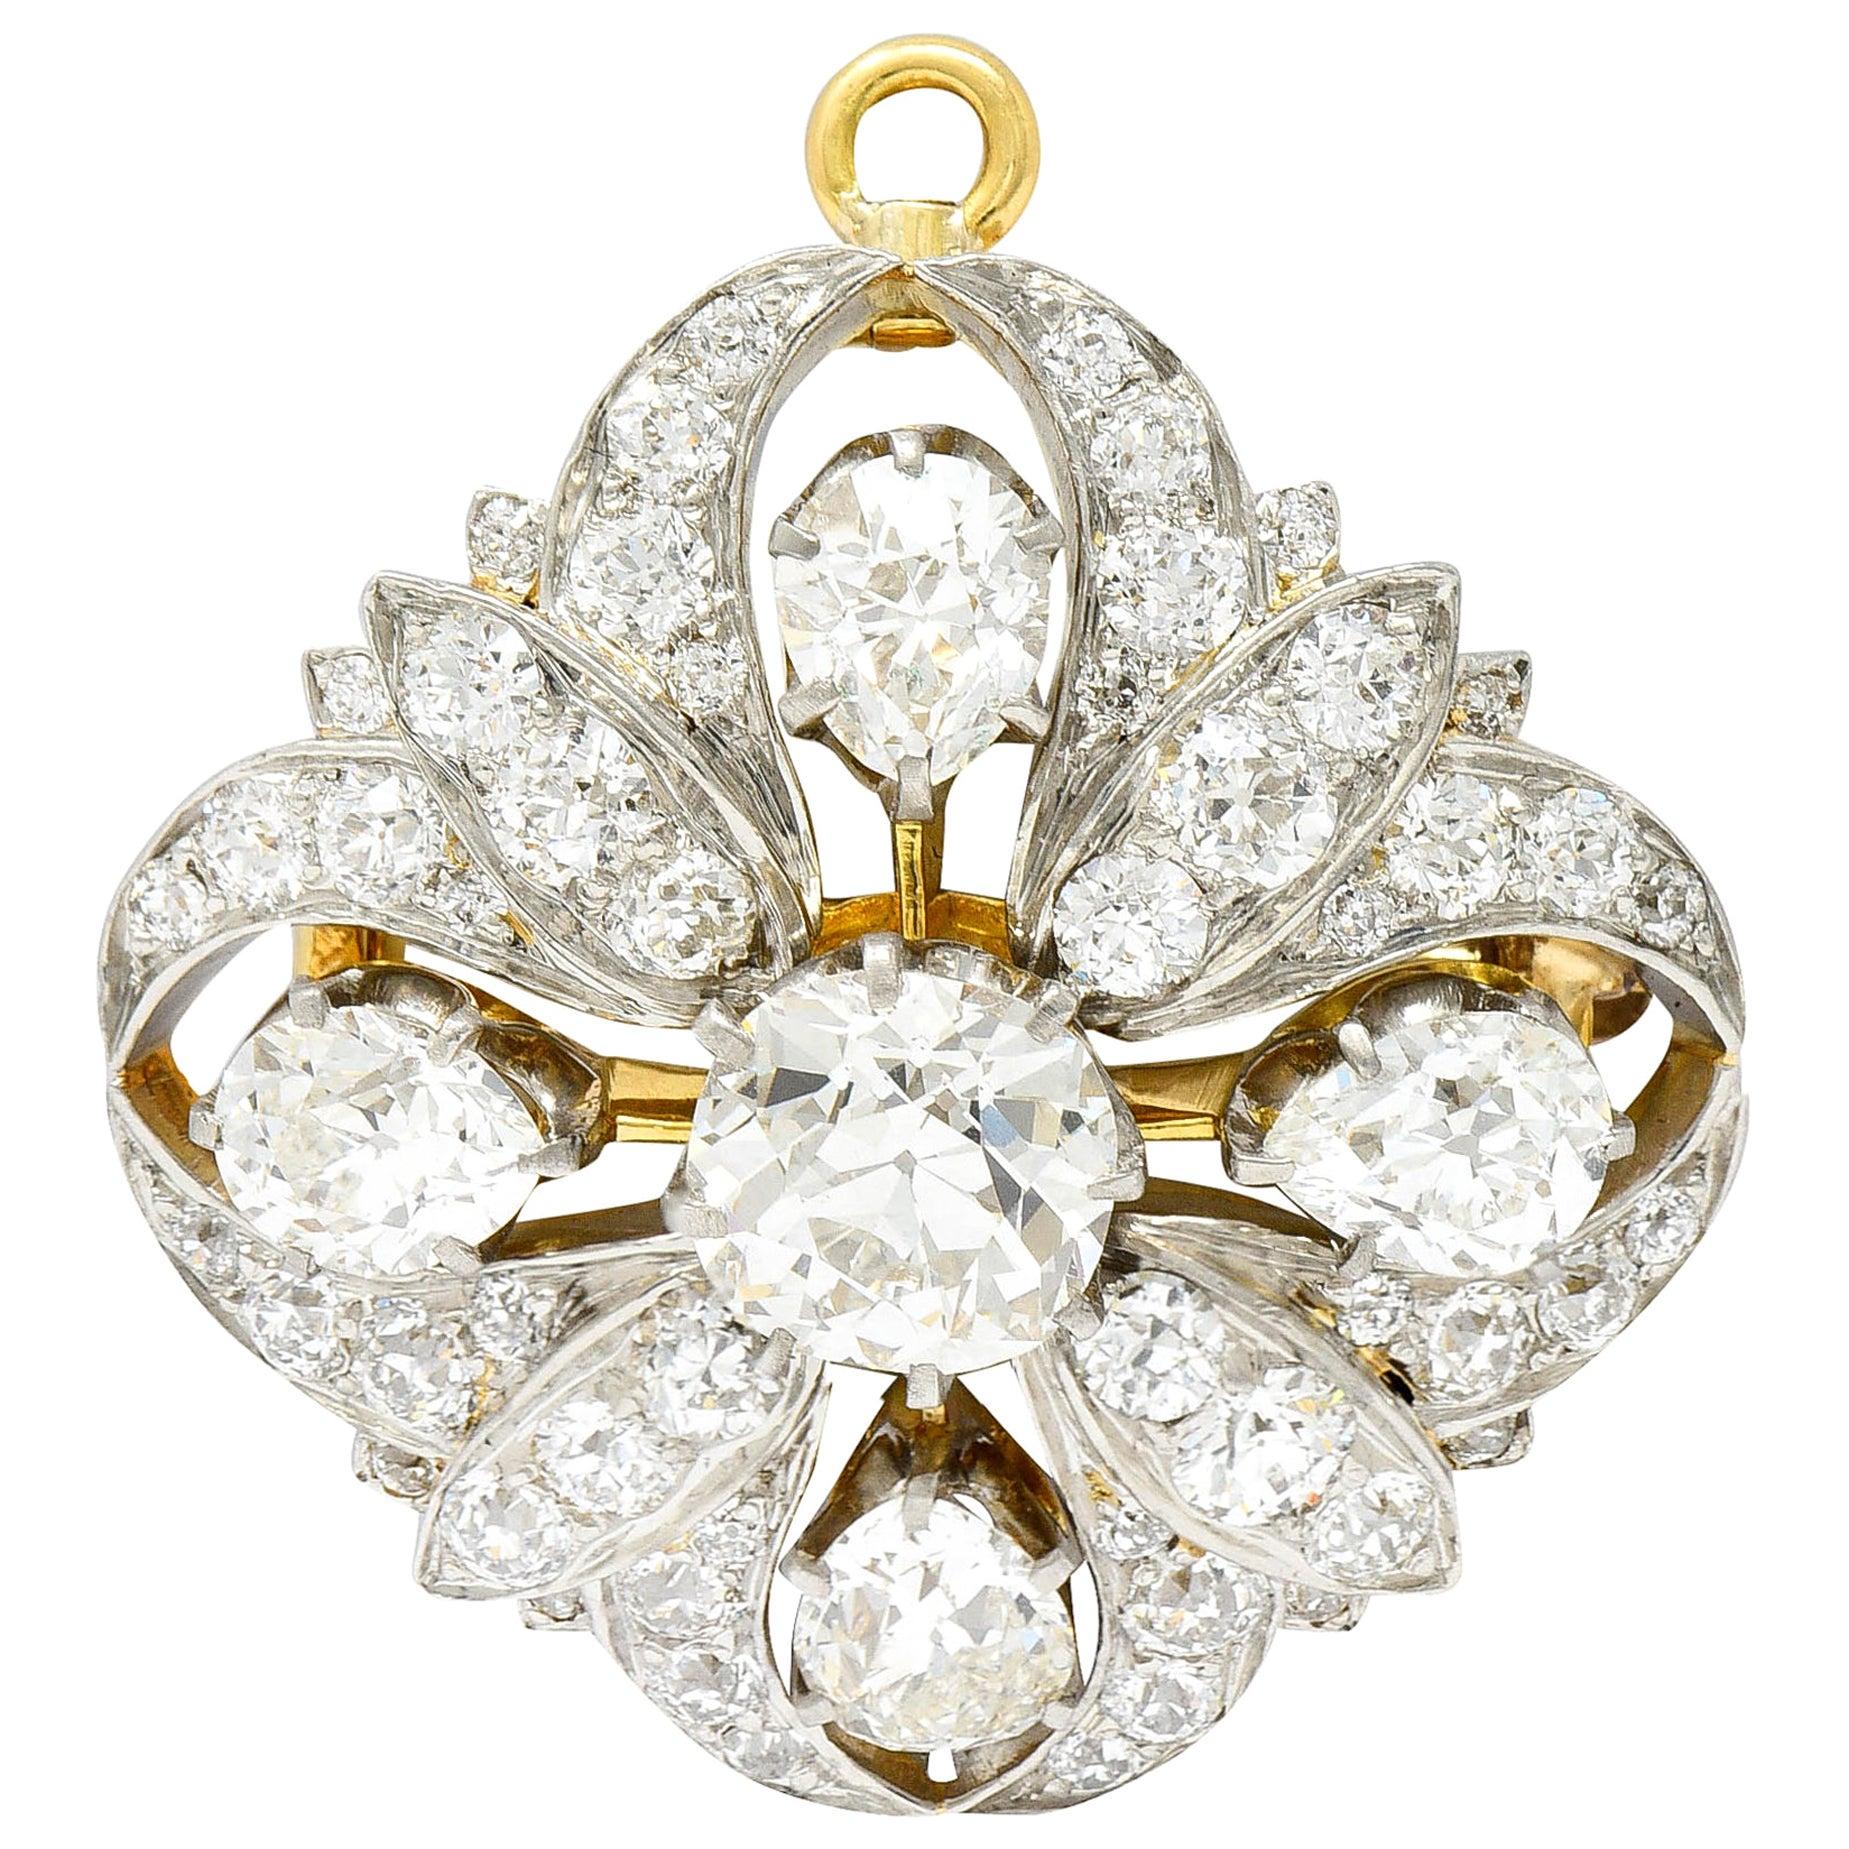 Tiffany & Co. 6.05 Carats Diamond Platinum 18 Karat Gold Quatrefoil Brooch